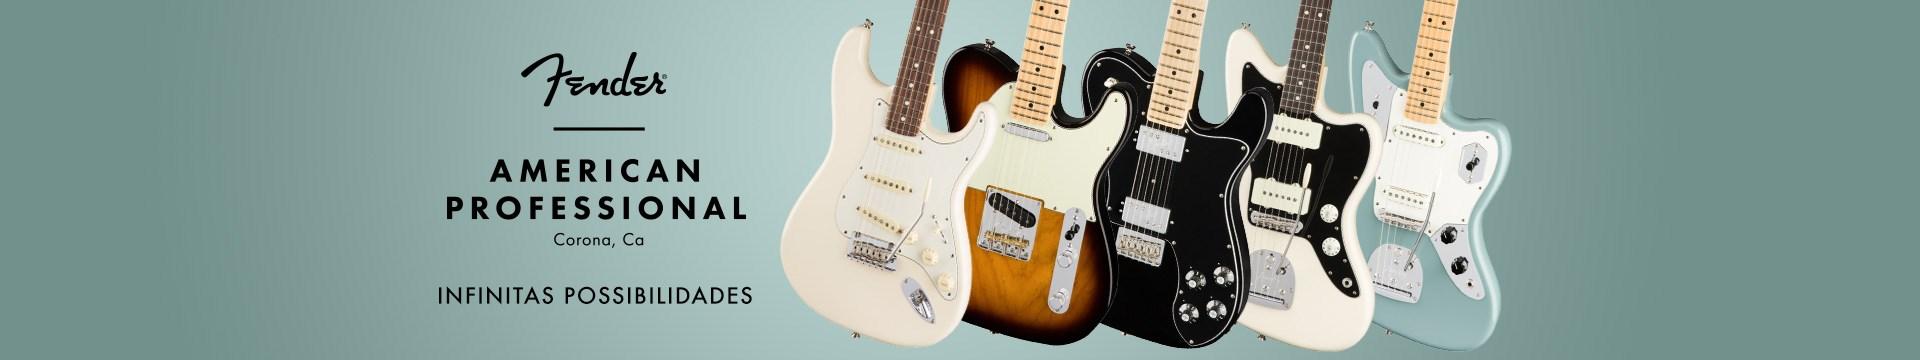 Fender Professional